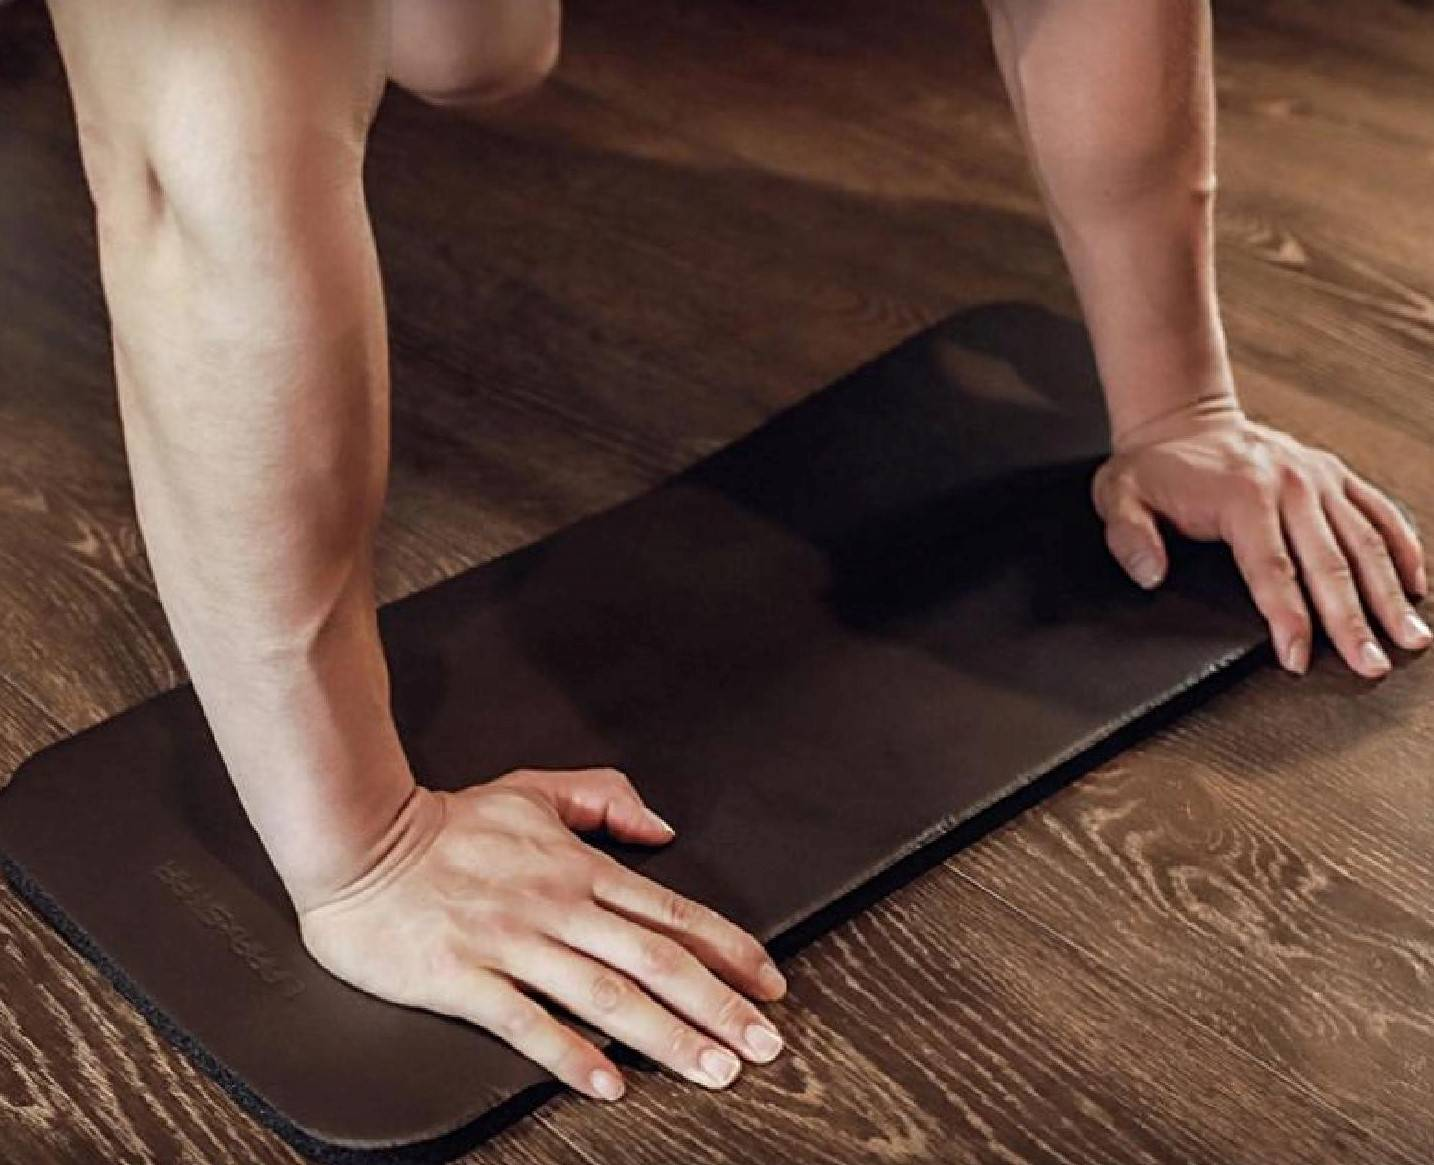 icrease flexibility, Gym pilates Yoga, Pull Rods